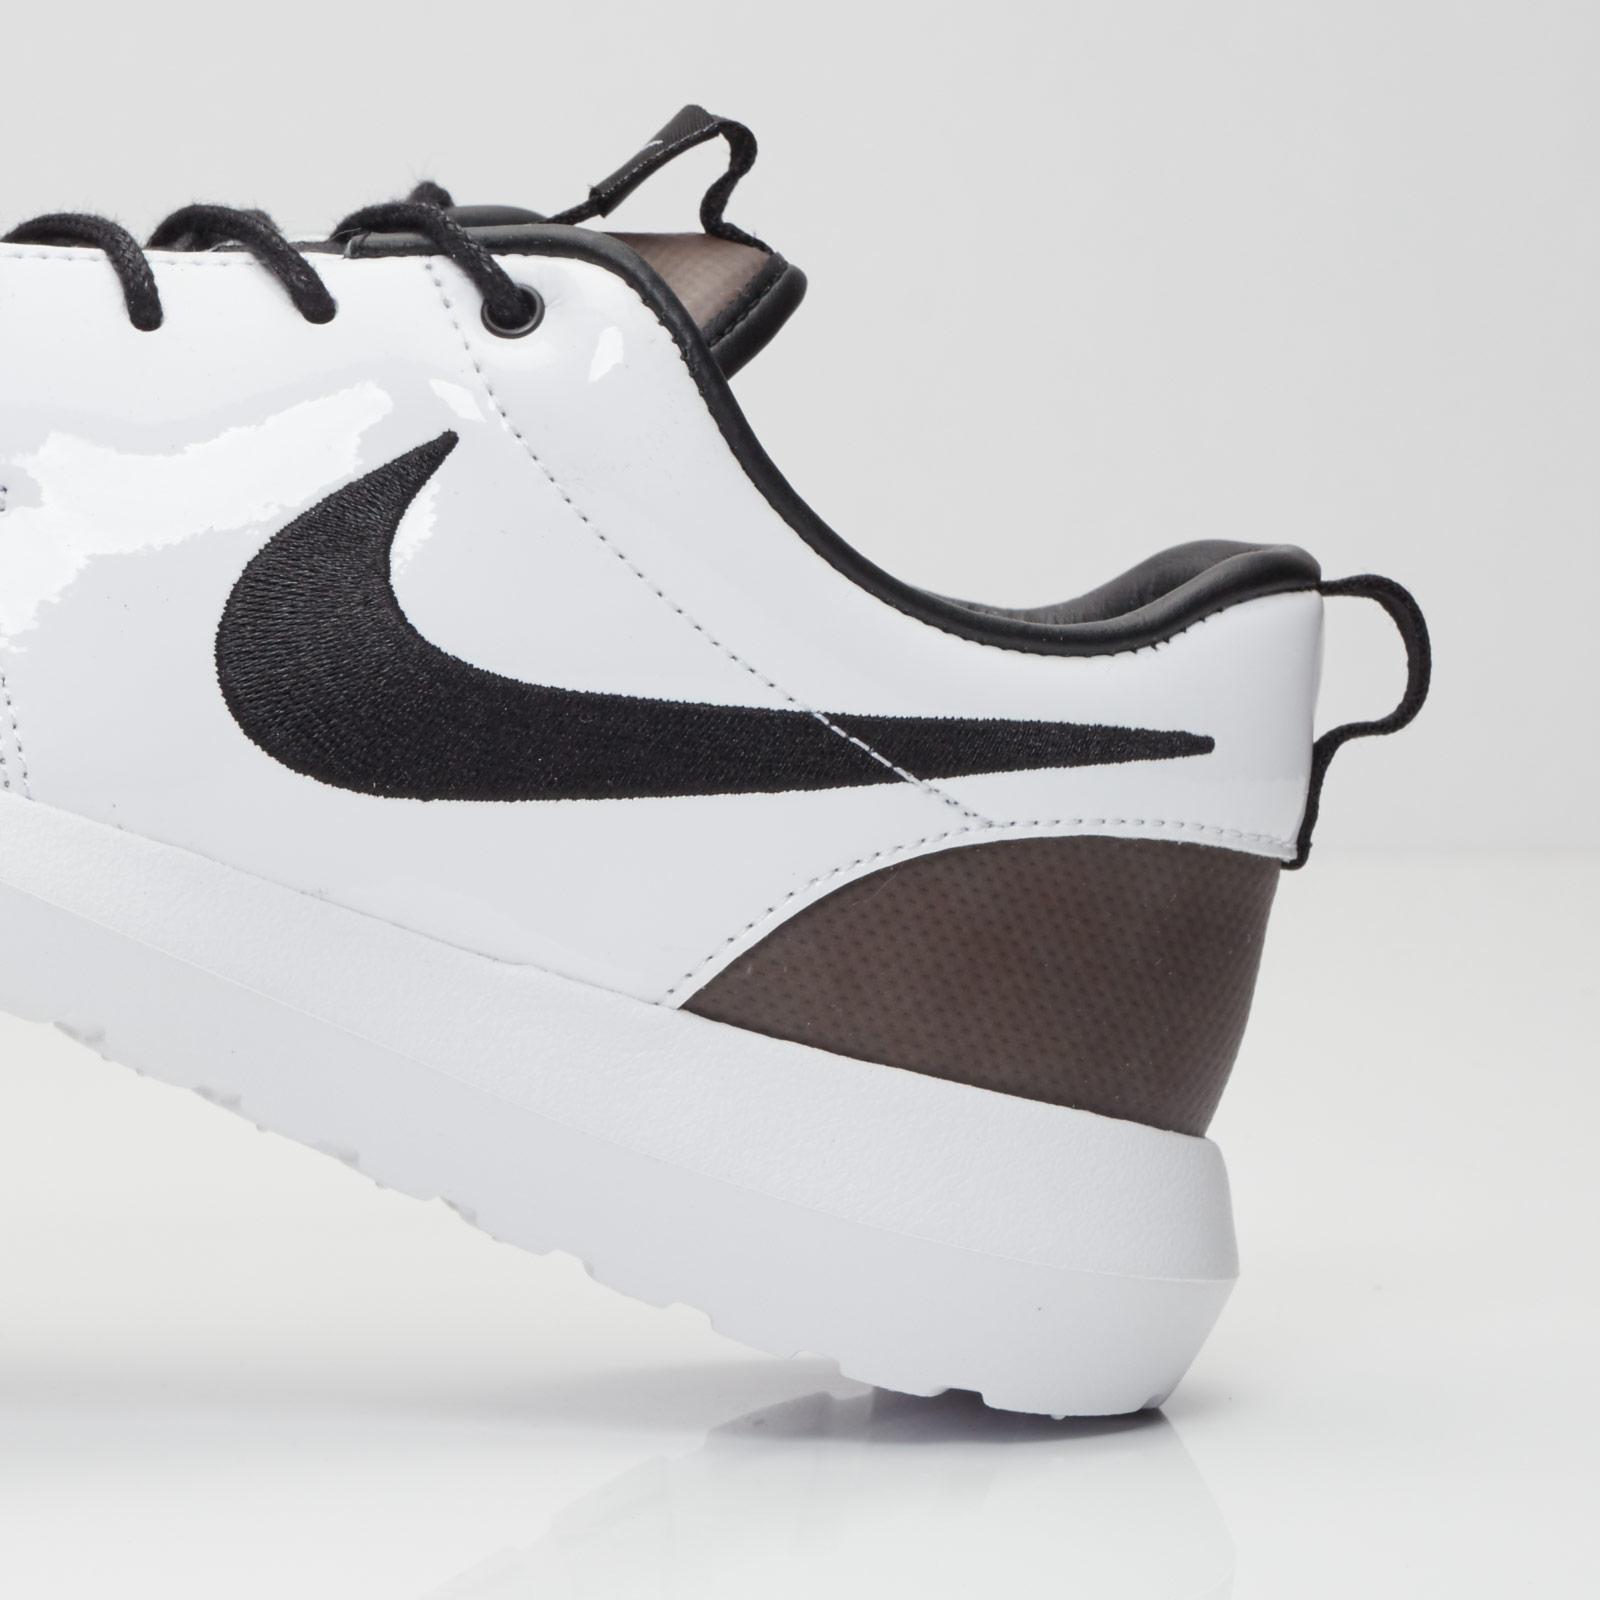 best service eaf62 7ed8d Nike W Roshe NM Pedro Lourenco - 866983-001 - Sneakersnstuff   sneakers    streetwear online since 1999